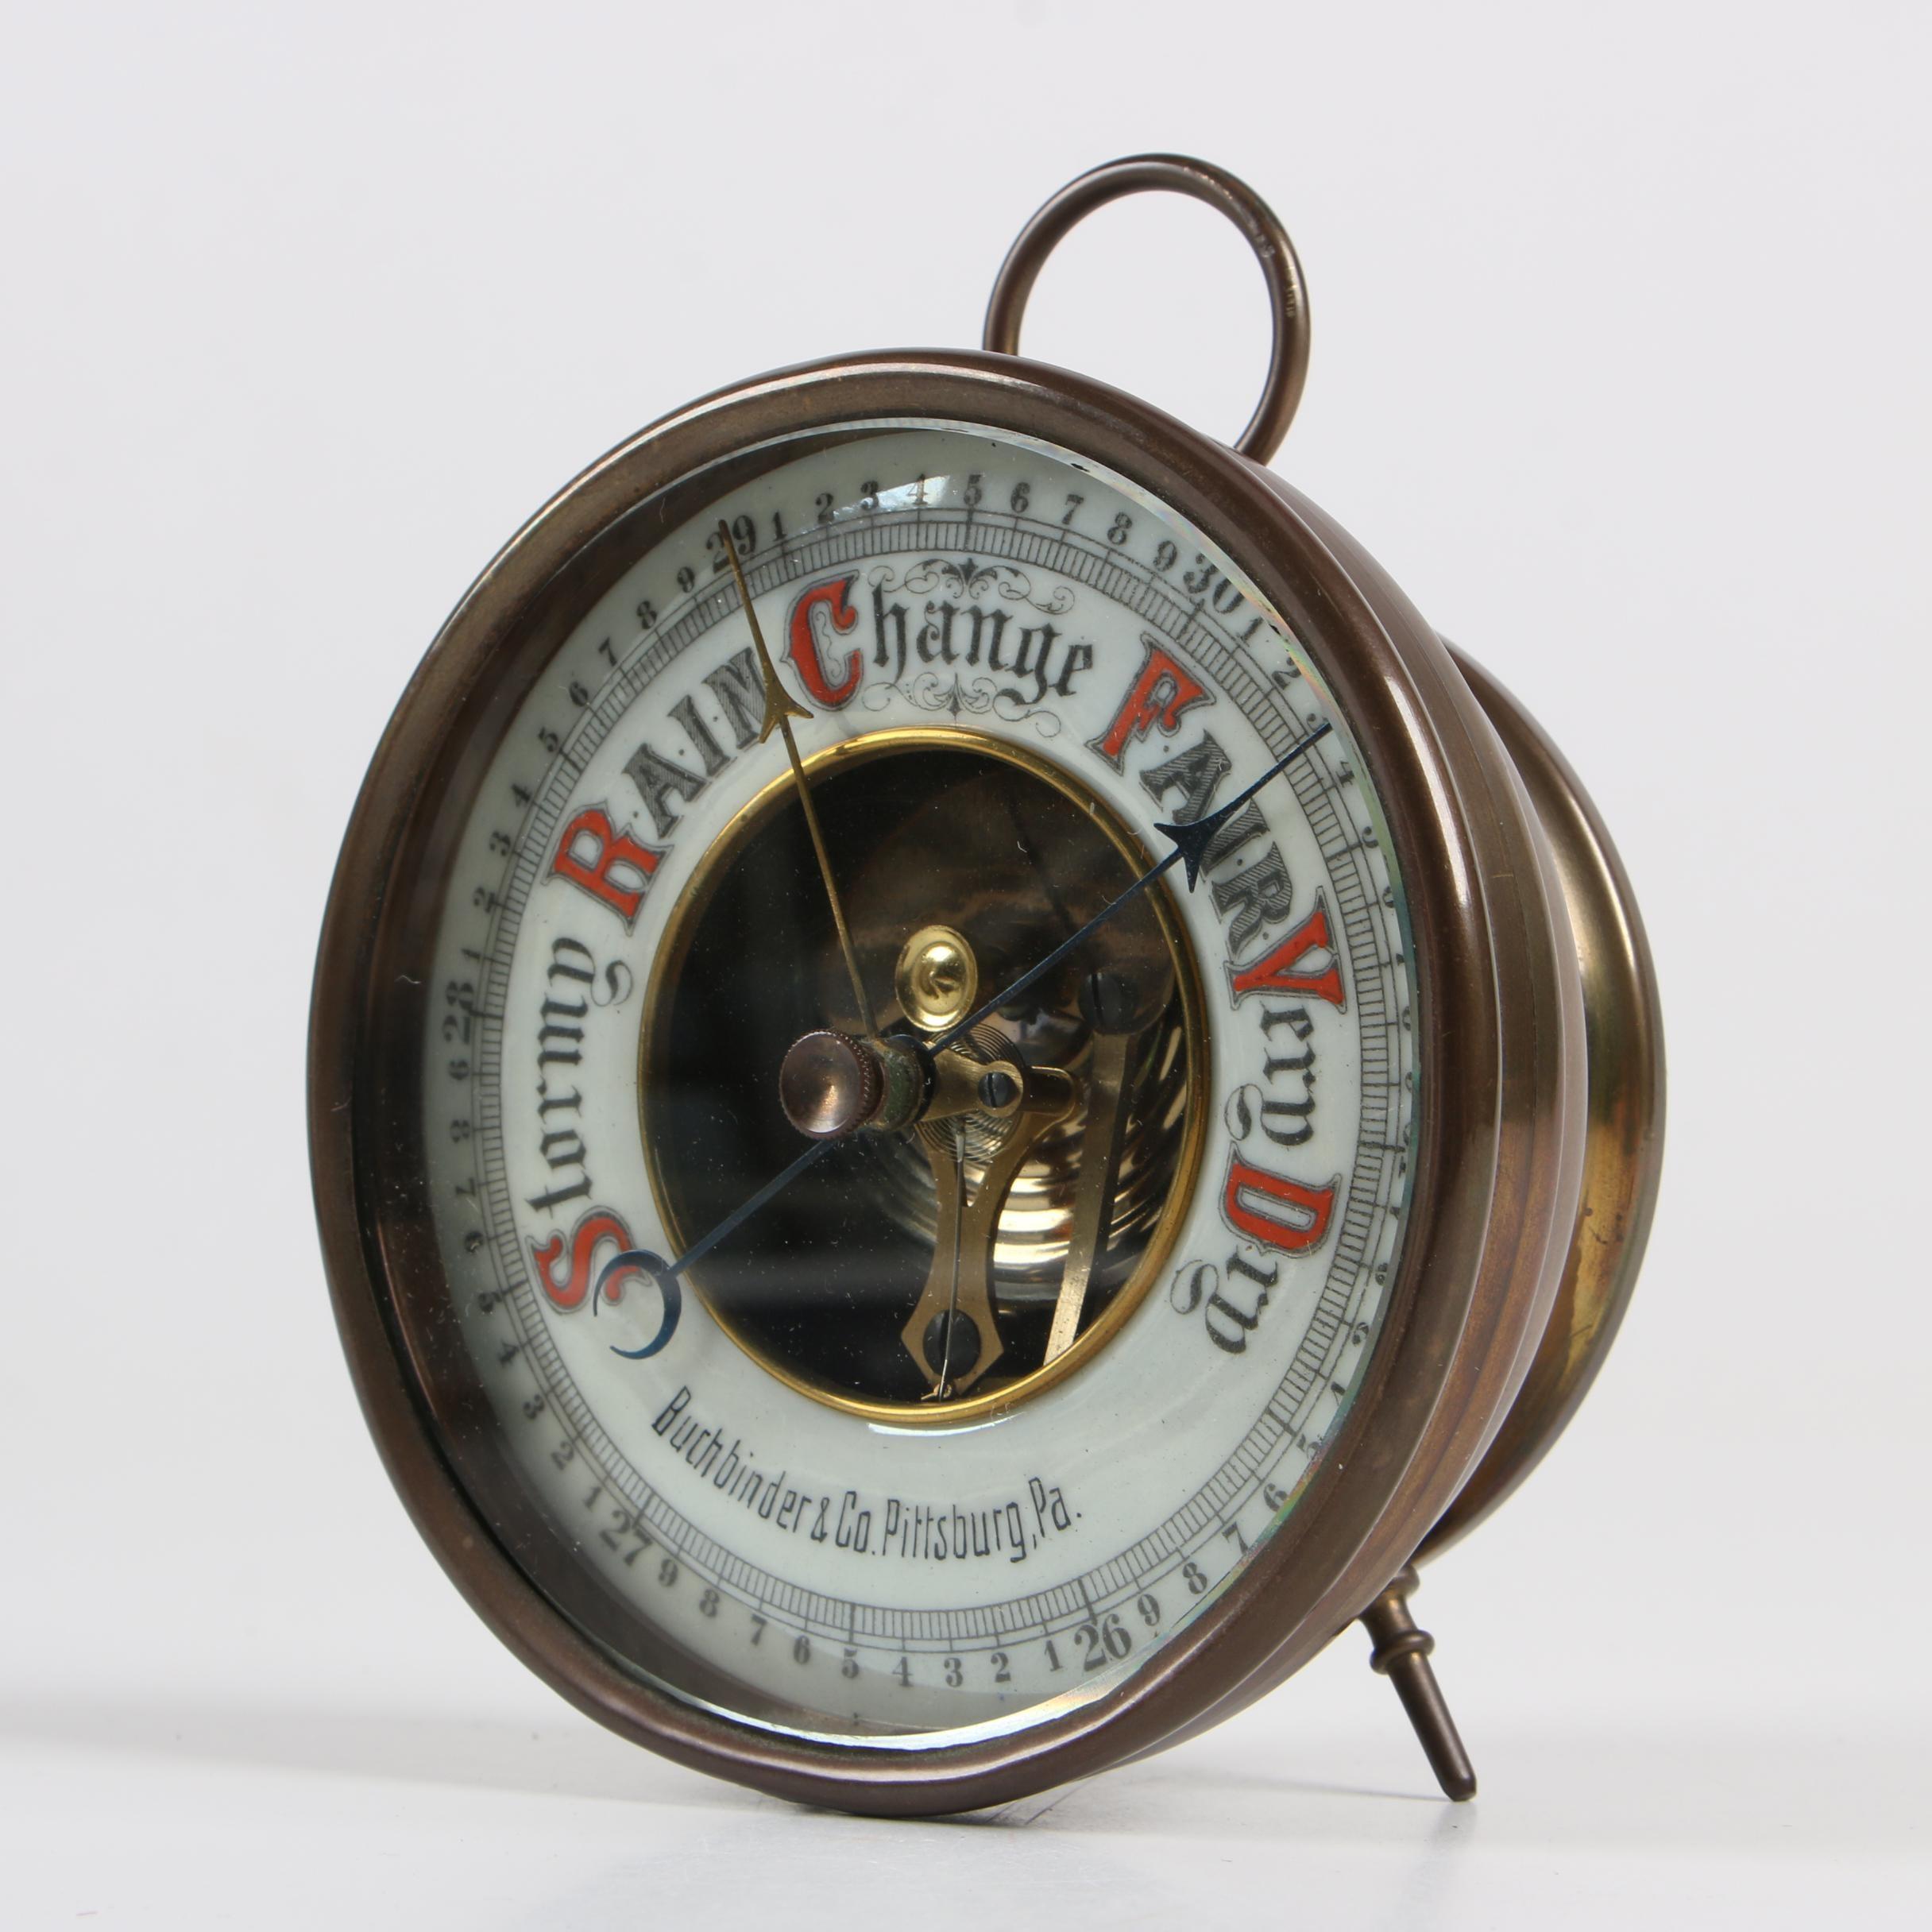 Buchbinder & Co. Barometer